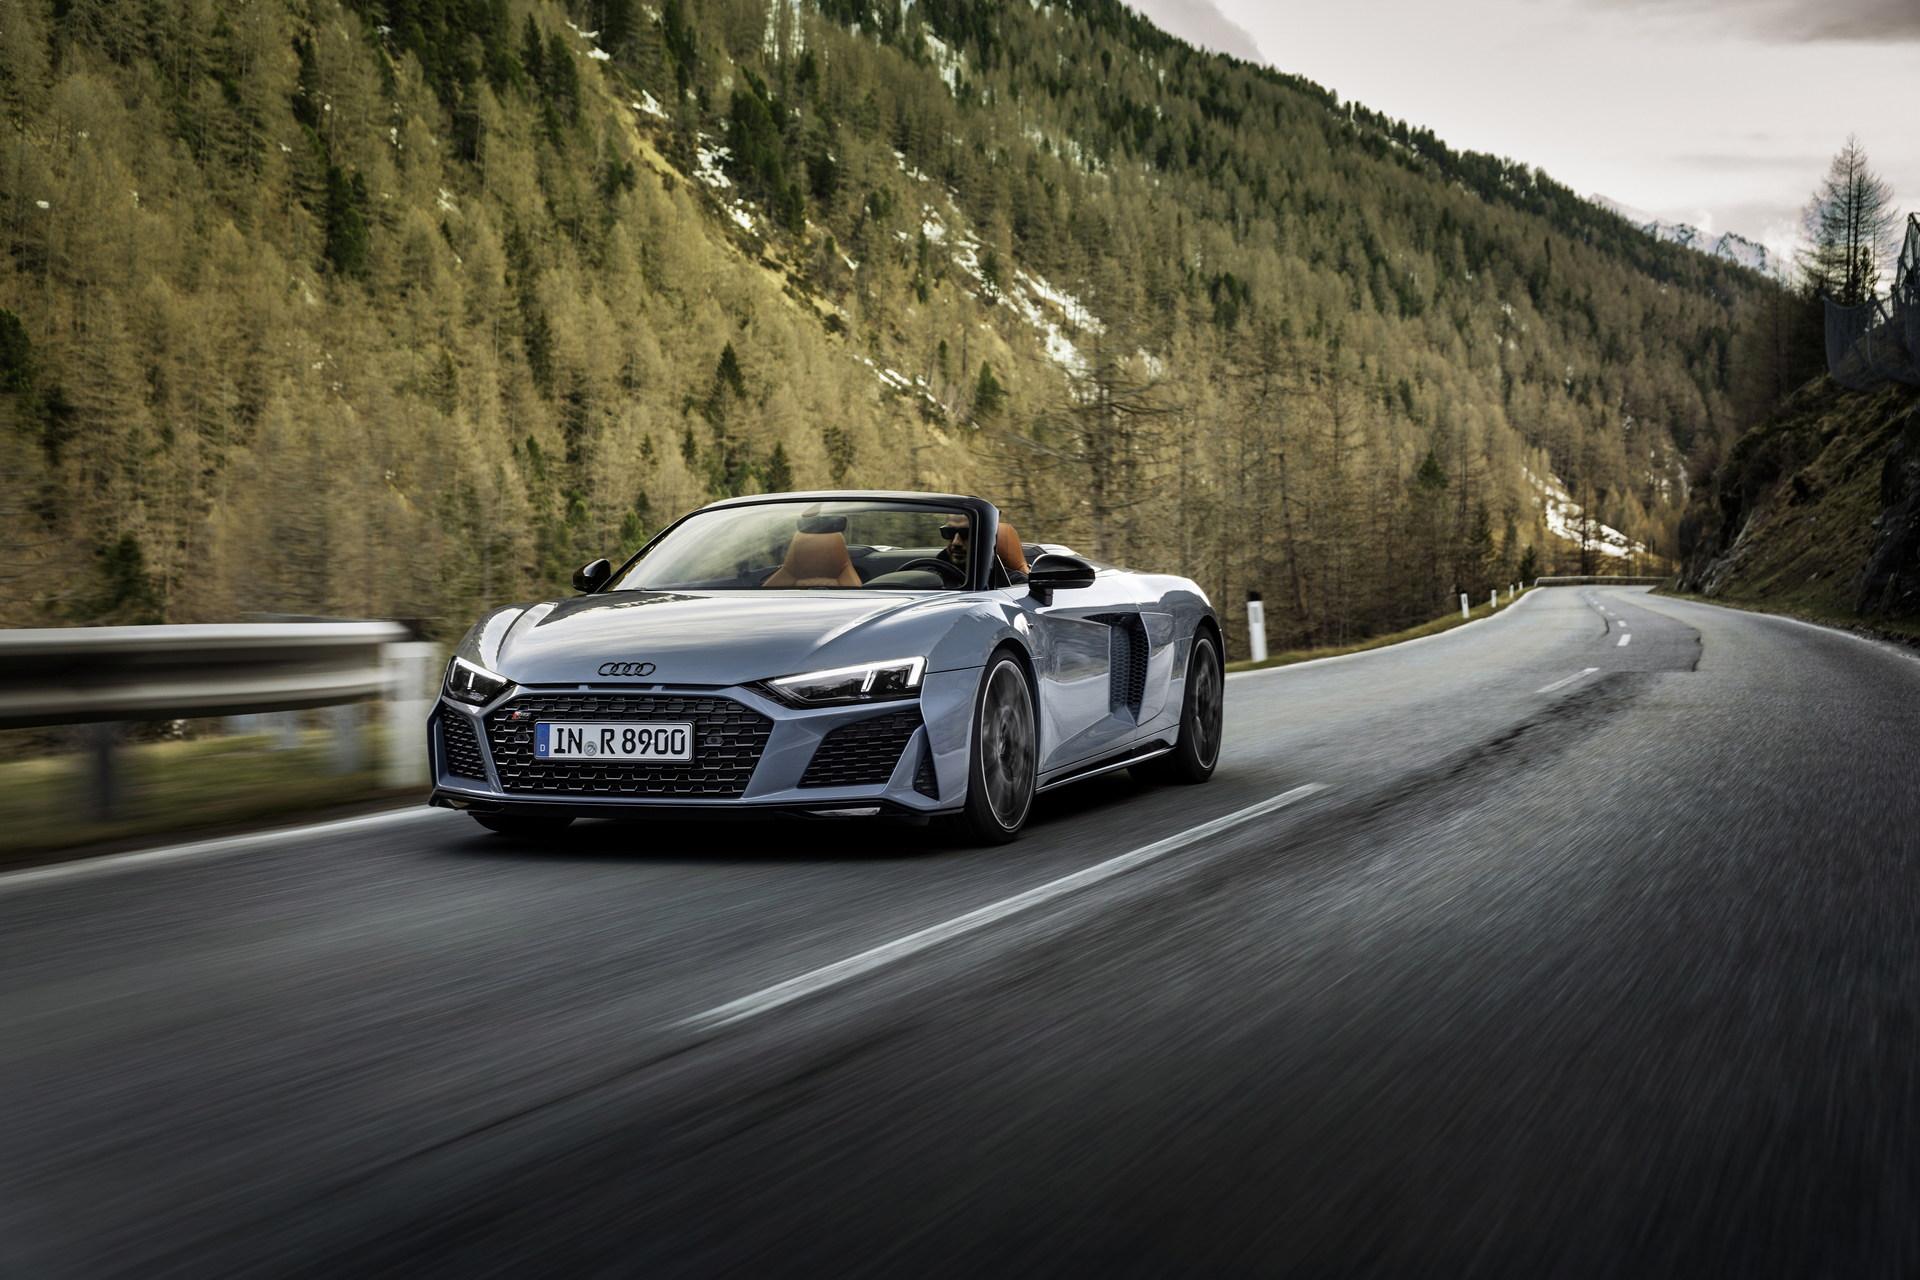 2022-Audi-R8-V10-Performance-RWD-1